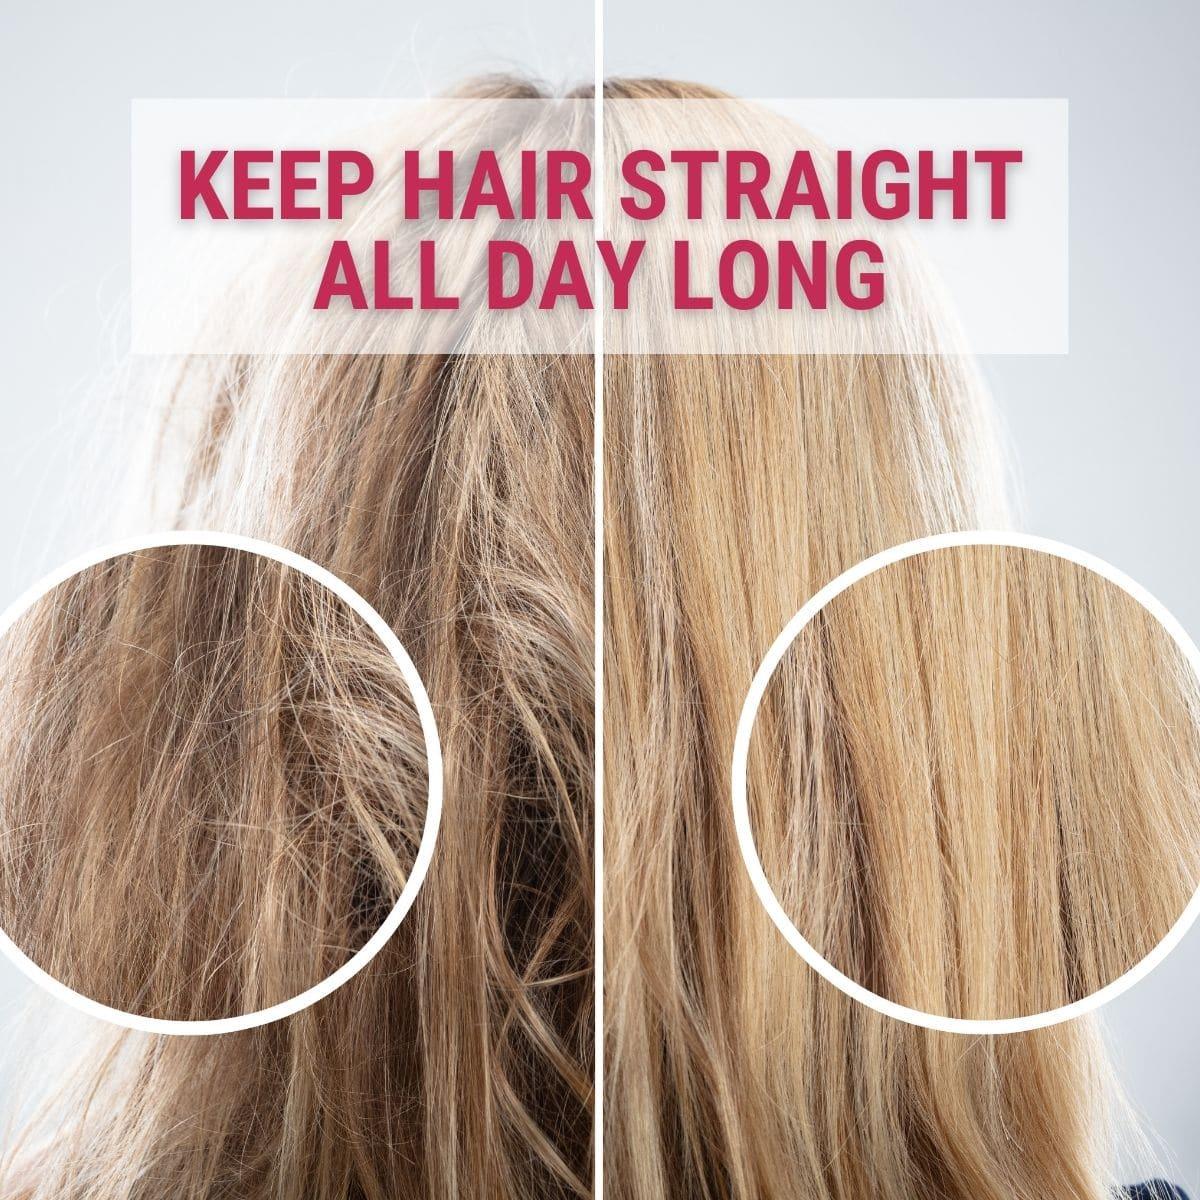 keep hair straight longer after straightening